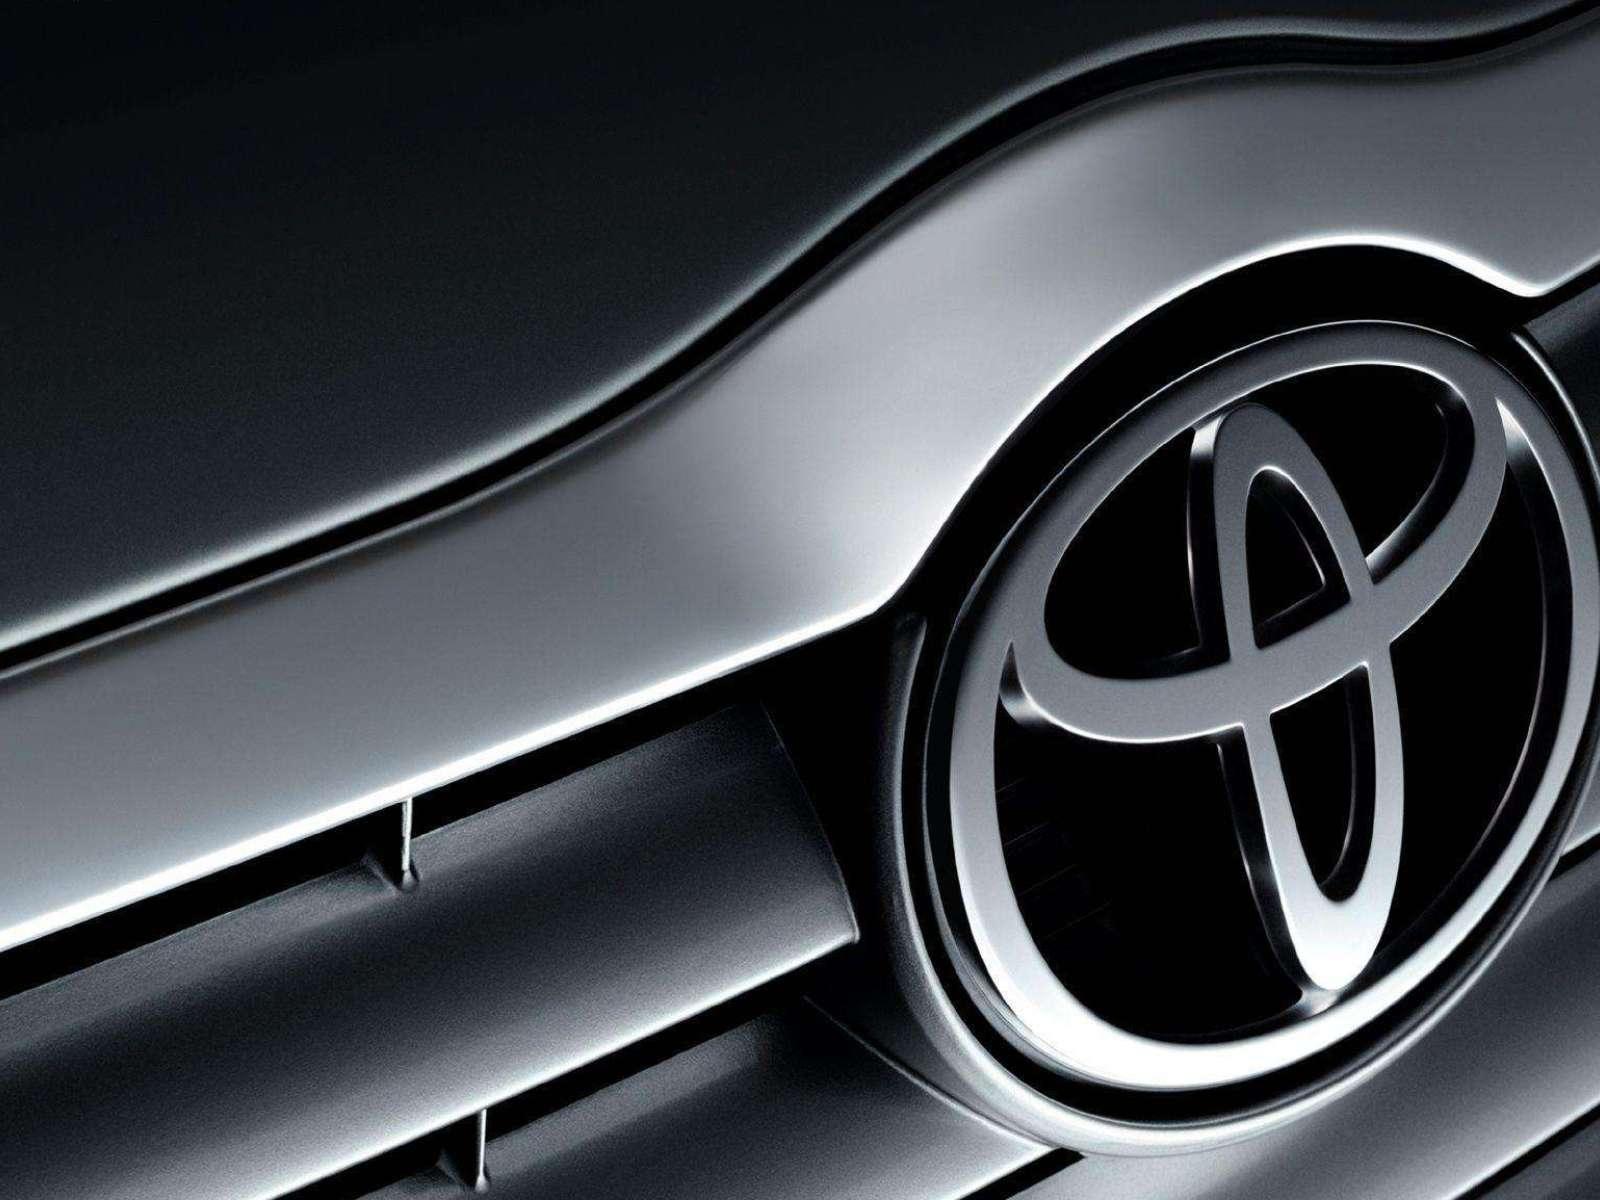 Toyota Land Cruiser Hd Wallpaper Toyota Logo Wallpapers Wallpaper Cave